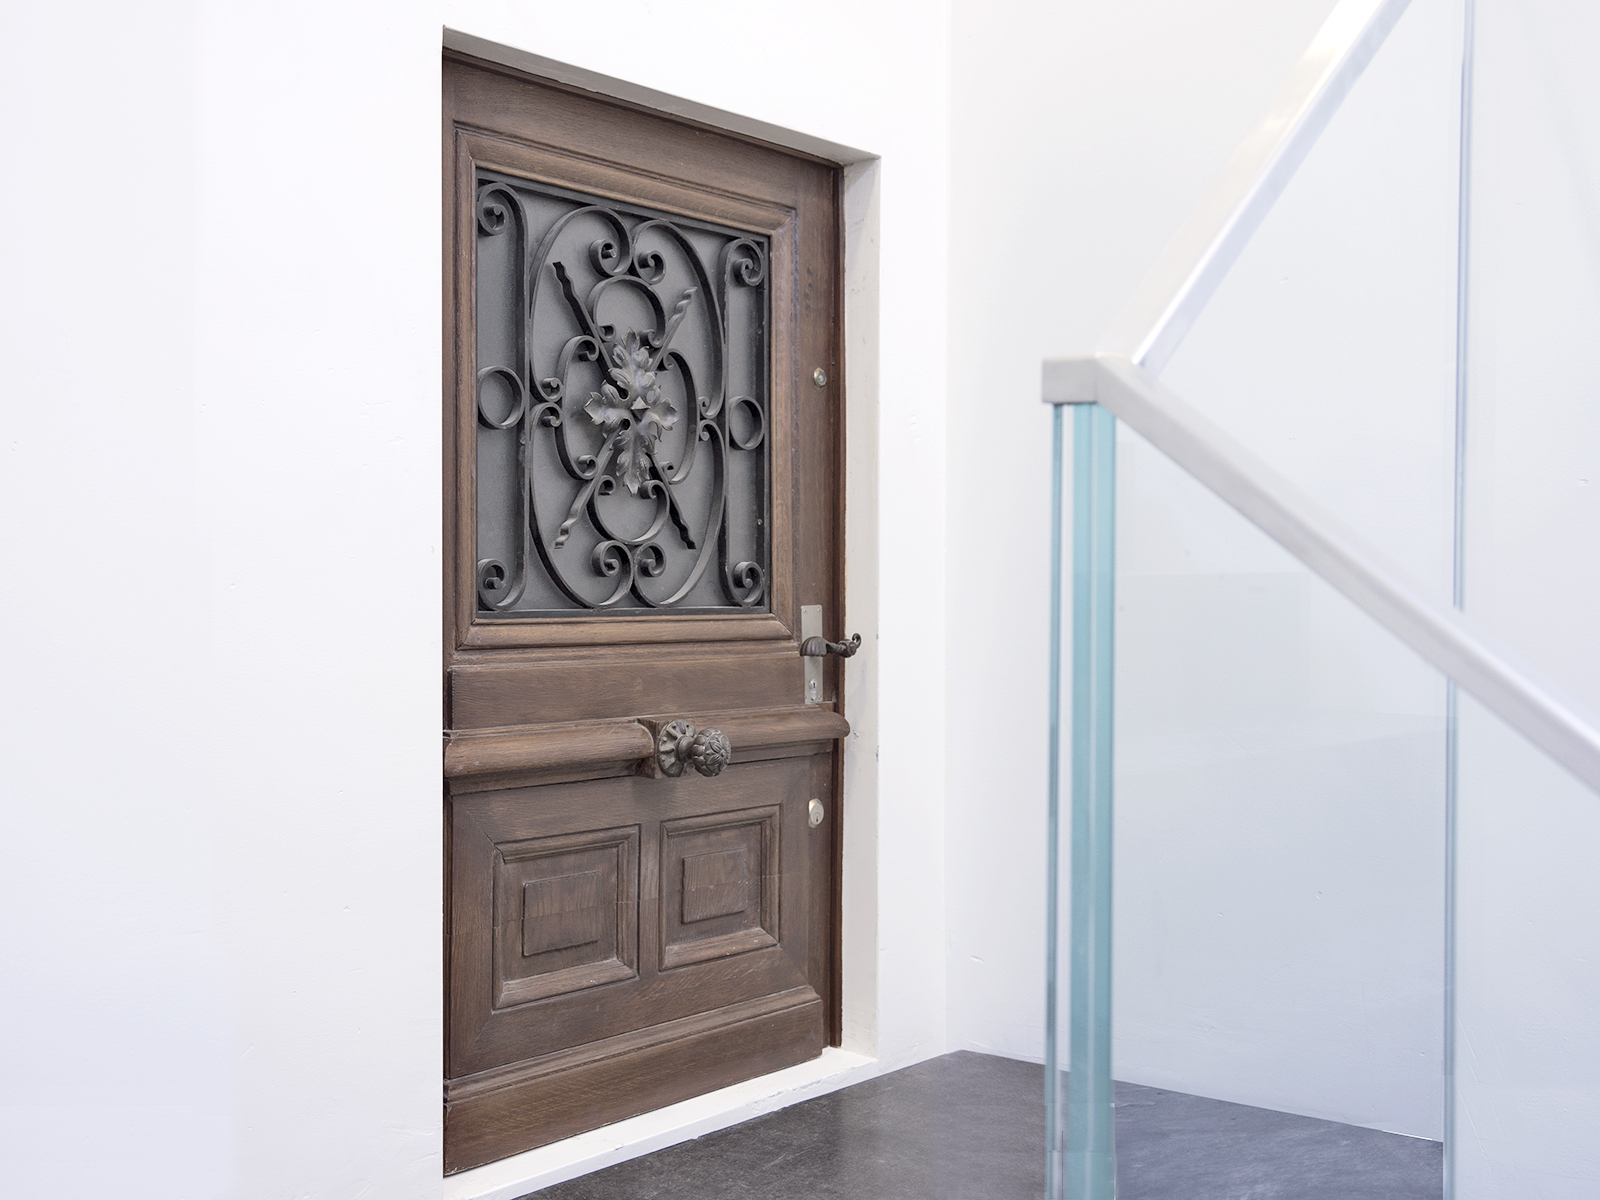 Benoit-Delaunay-artiste-sculptures-2011-Elapsed Time-02